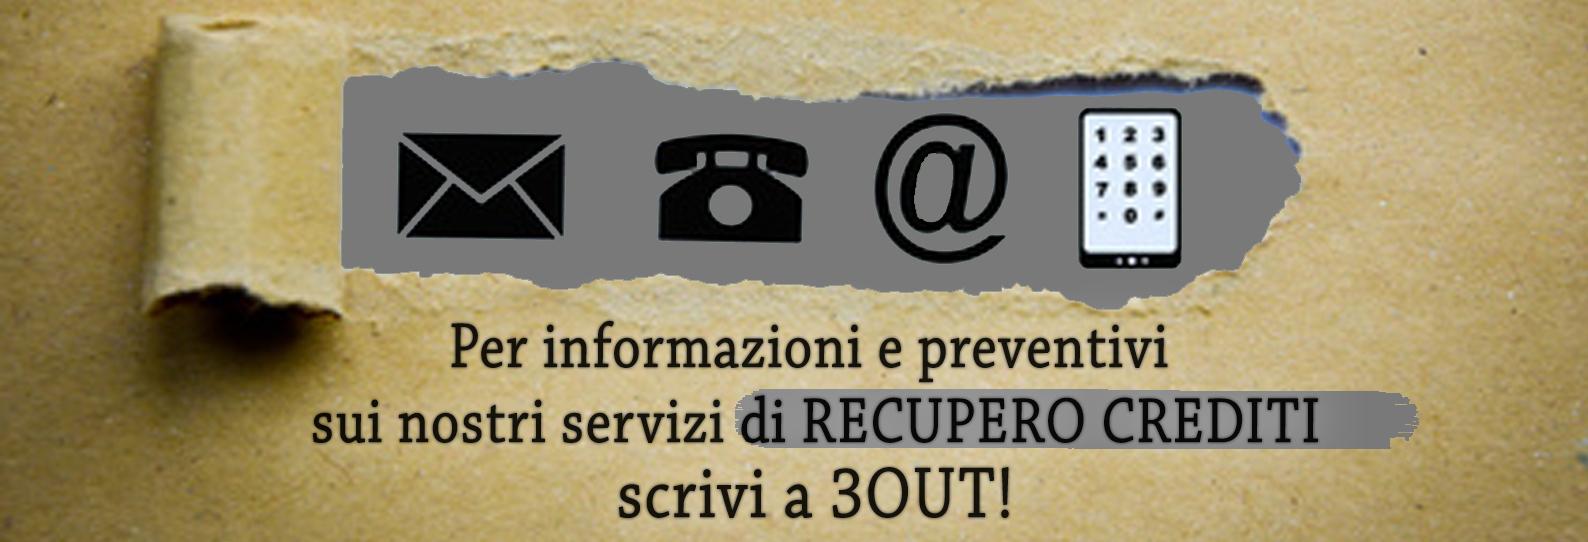 3Out_sito pll_banner_recuperocrediti